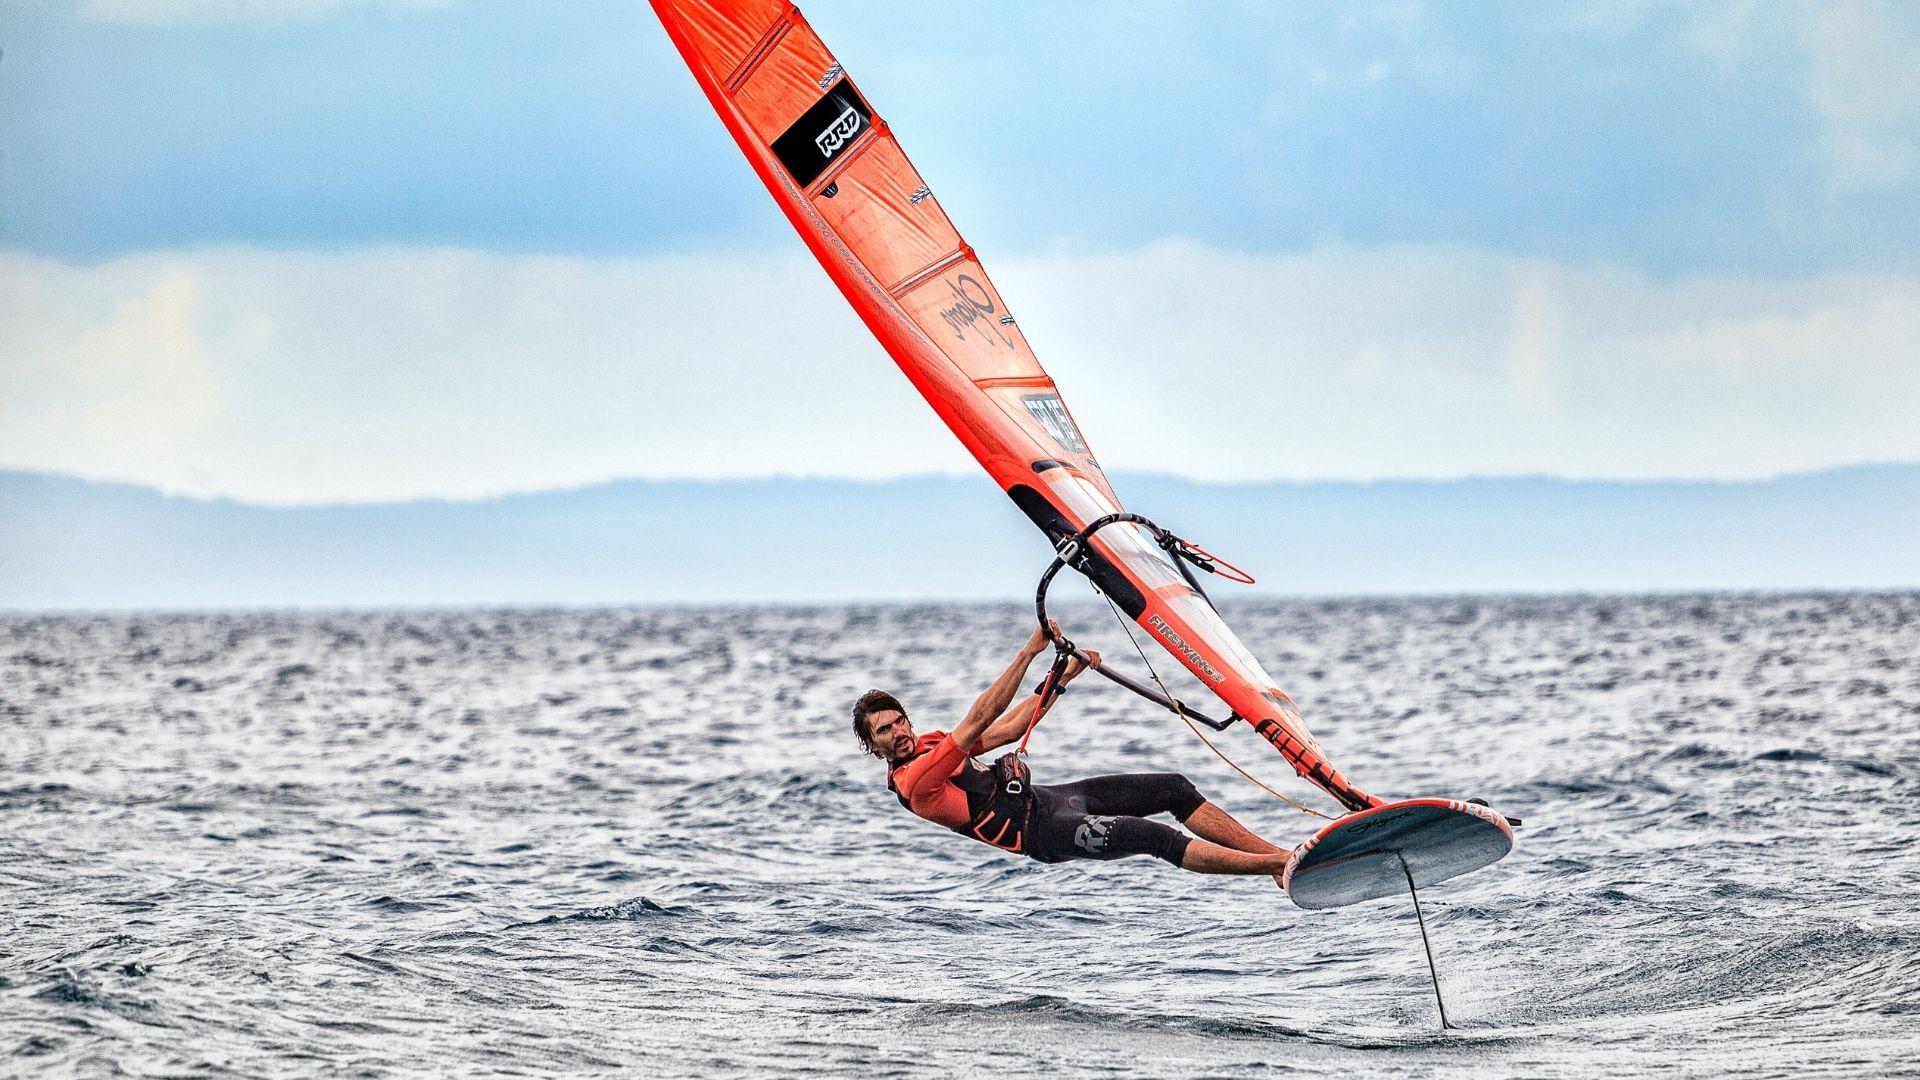 Windsurf foiling